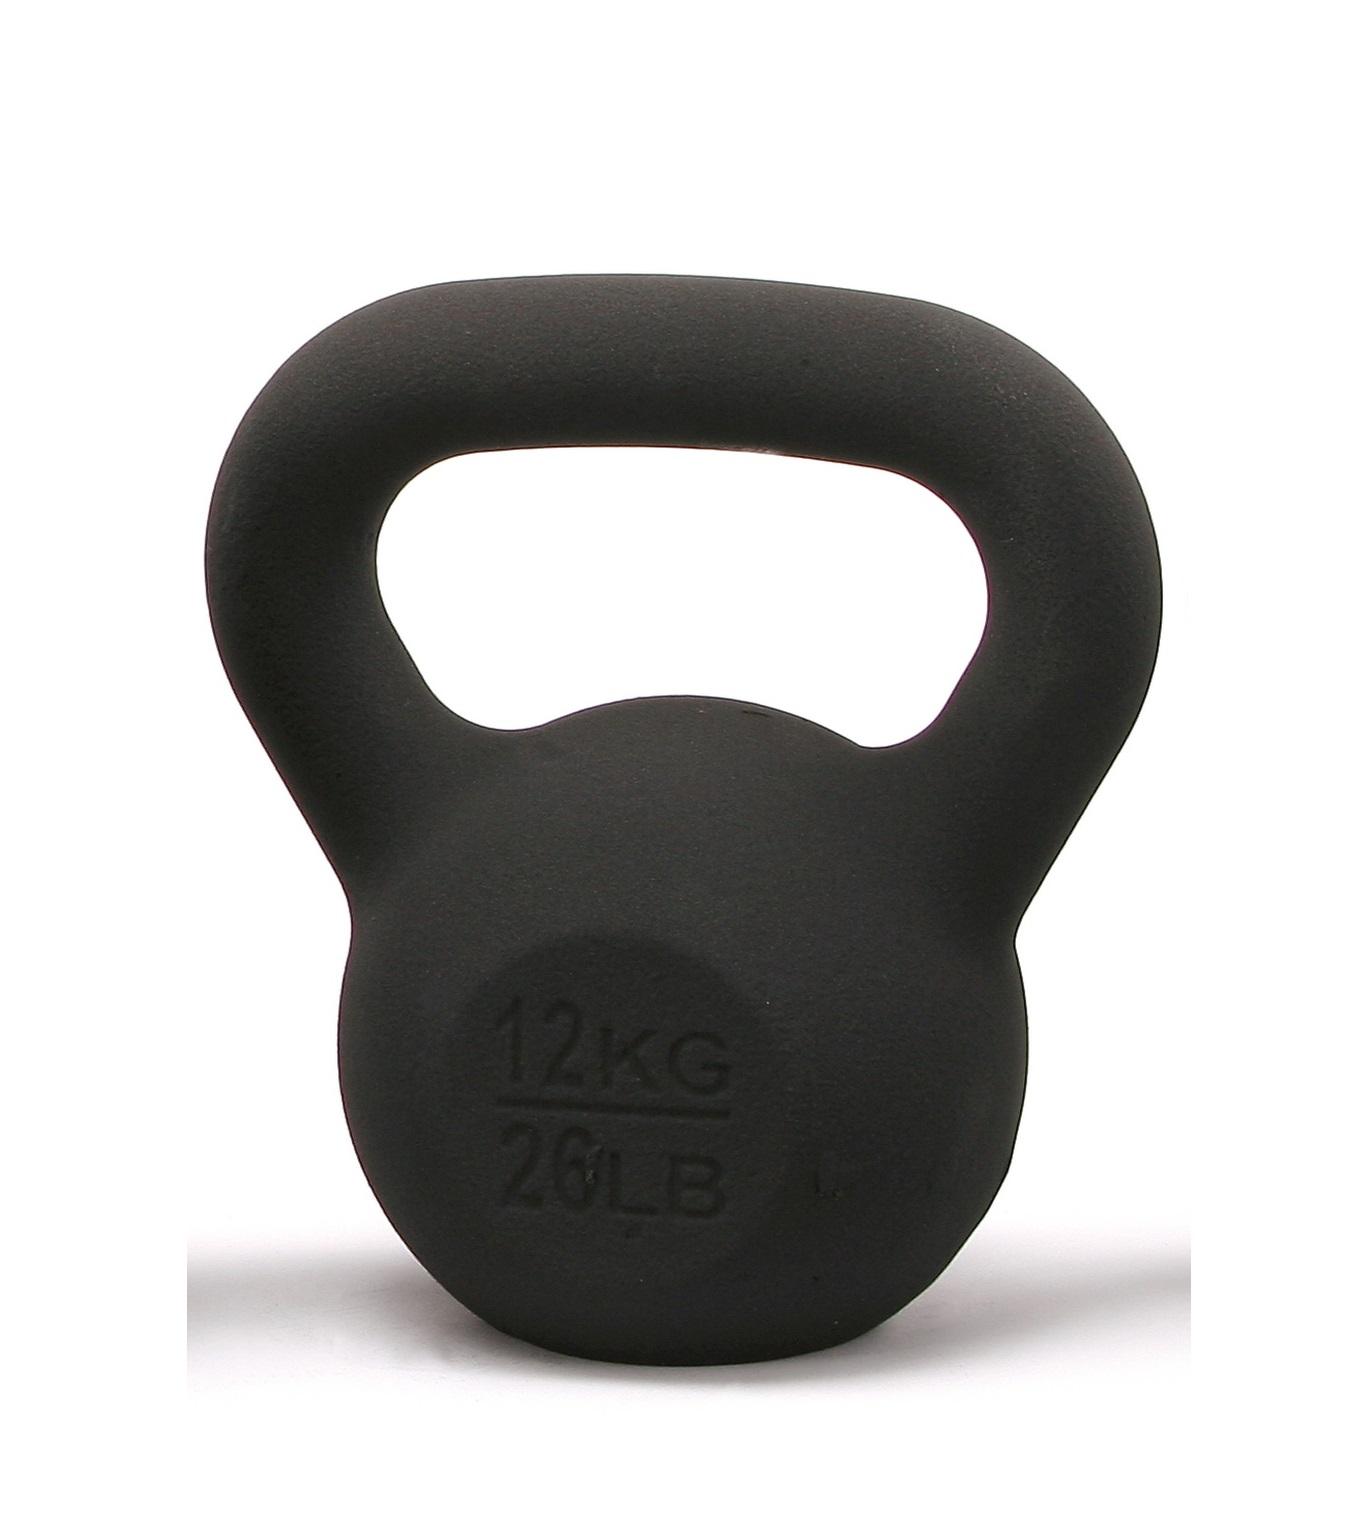 【Fitek 健身網】☆12KG壺鈴☆12公斤壺鈴 鑄鐵壺鈴 ☆Cast Iron Kettlebell☆健身重量訓練/有氧運動/肌耐力訓練㊣台灣製